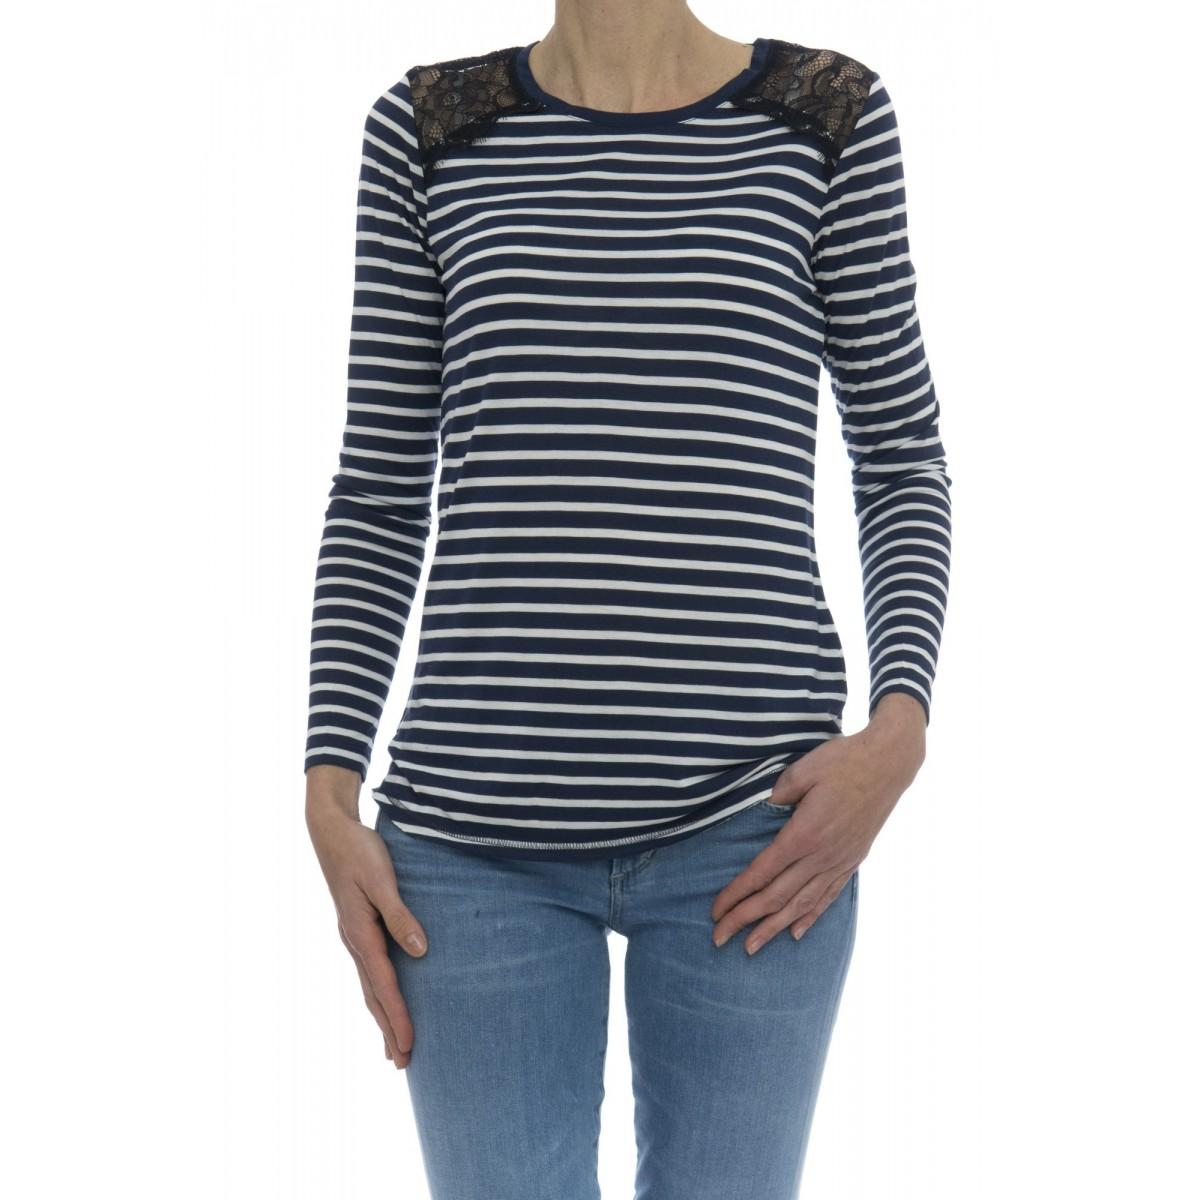 T-shirt donna - 17215 t-shirt m-l modal